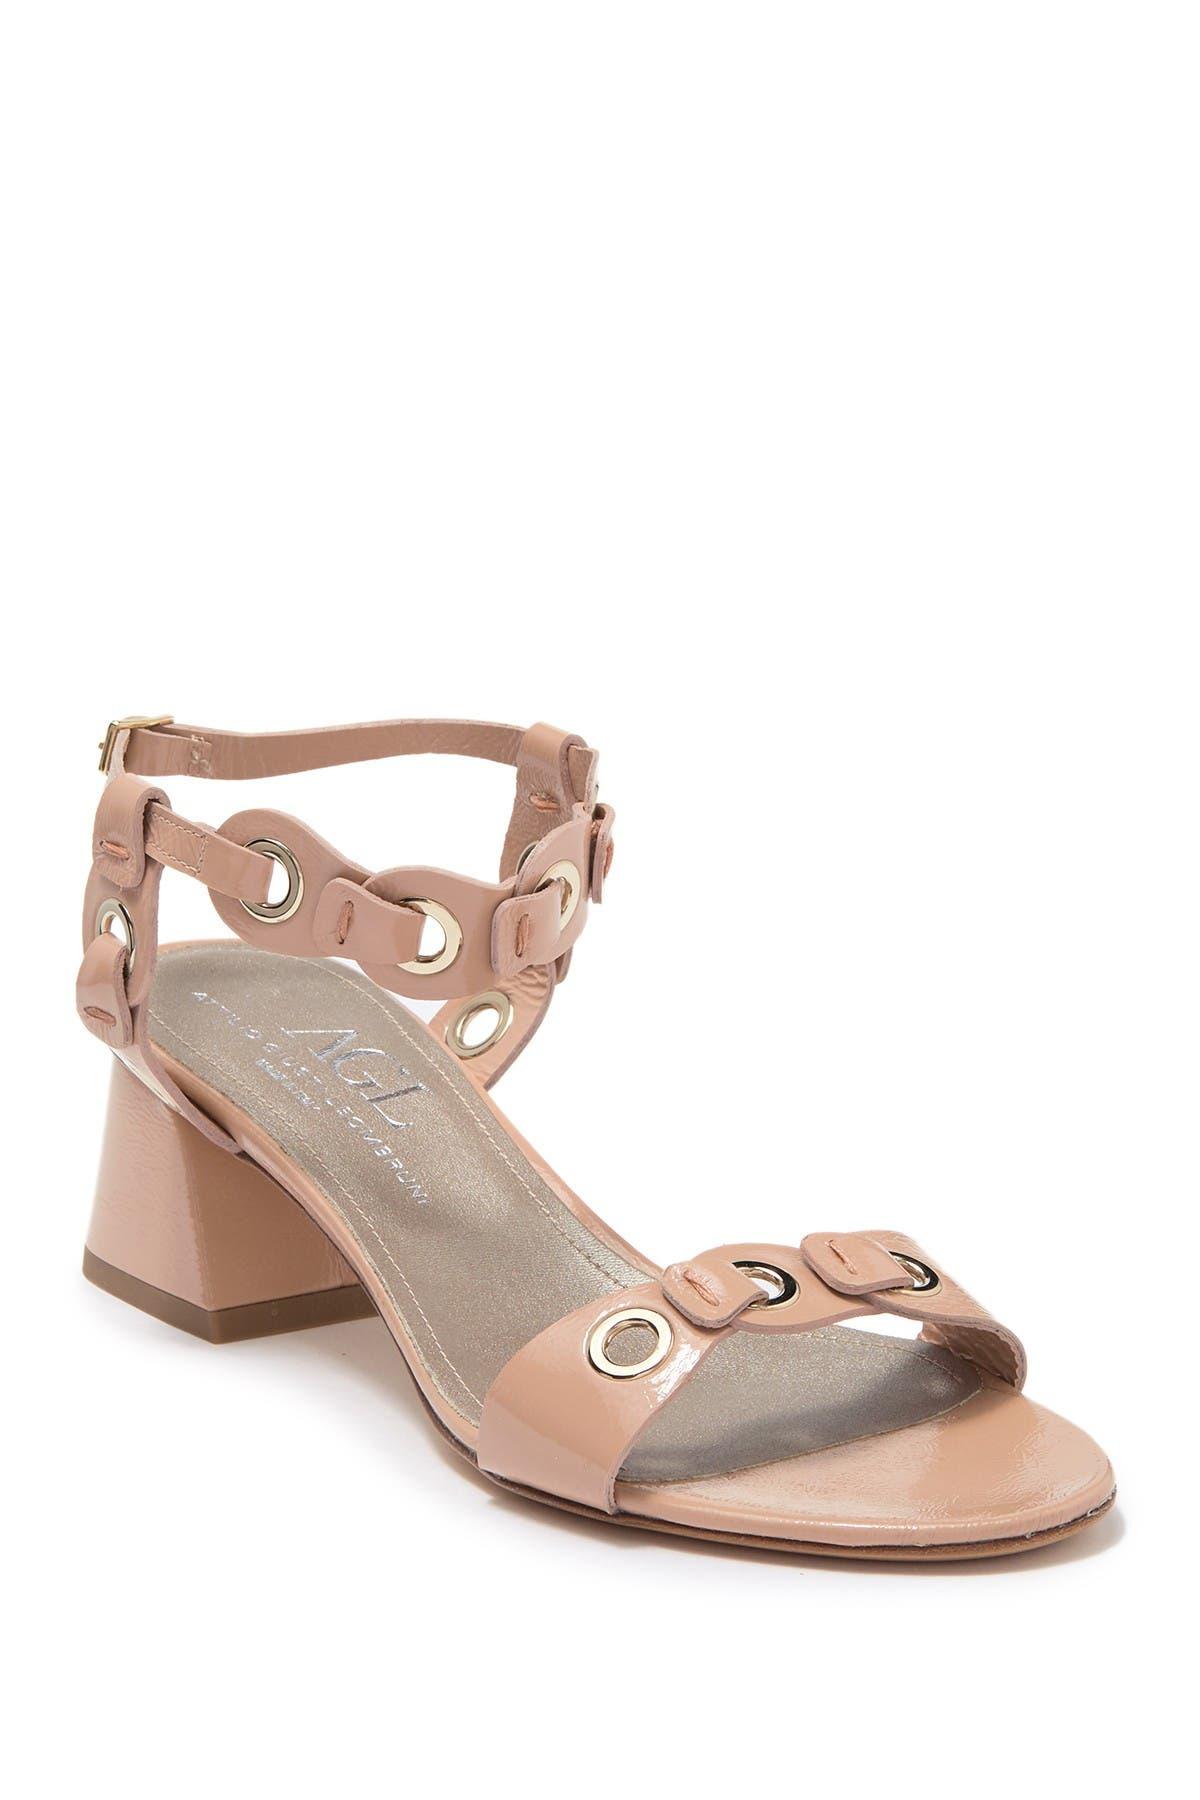 Image of AGL Patent Leather Grommet Block Heel Sandal